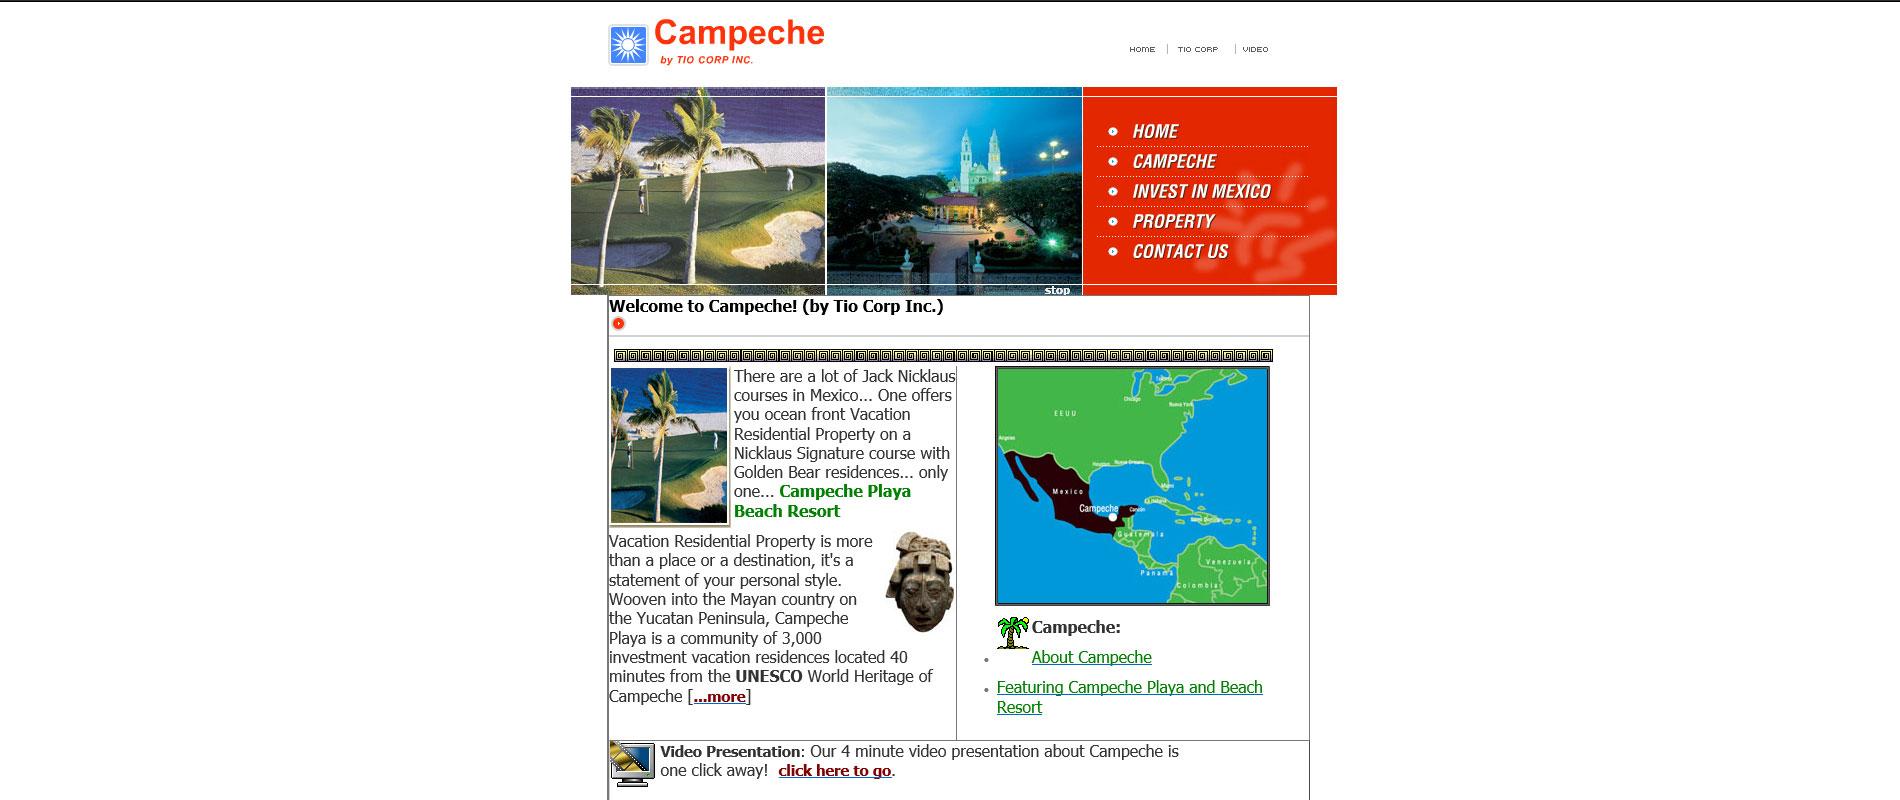 Tio Corp Campeche